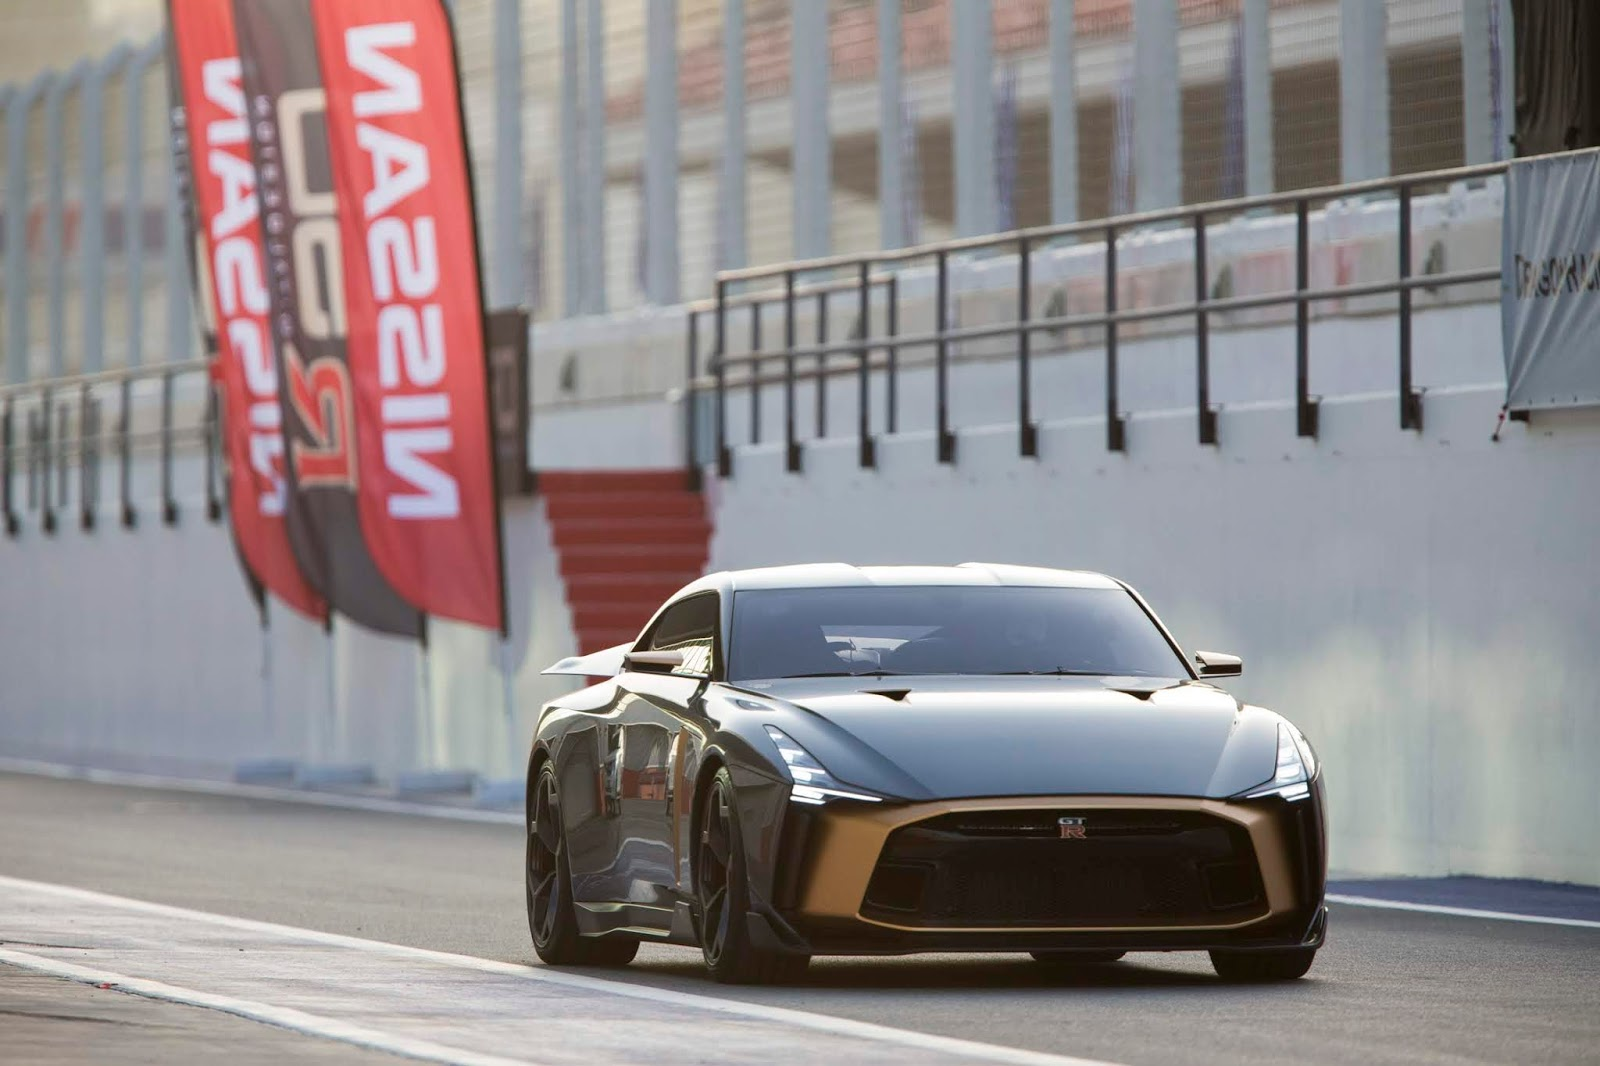 Nissan2BGT R502Bby2BItaldesign2BMiddle2BEast To Nissan GT-R50 πάει... Ντουμπάι